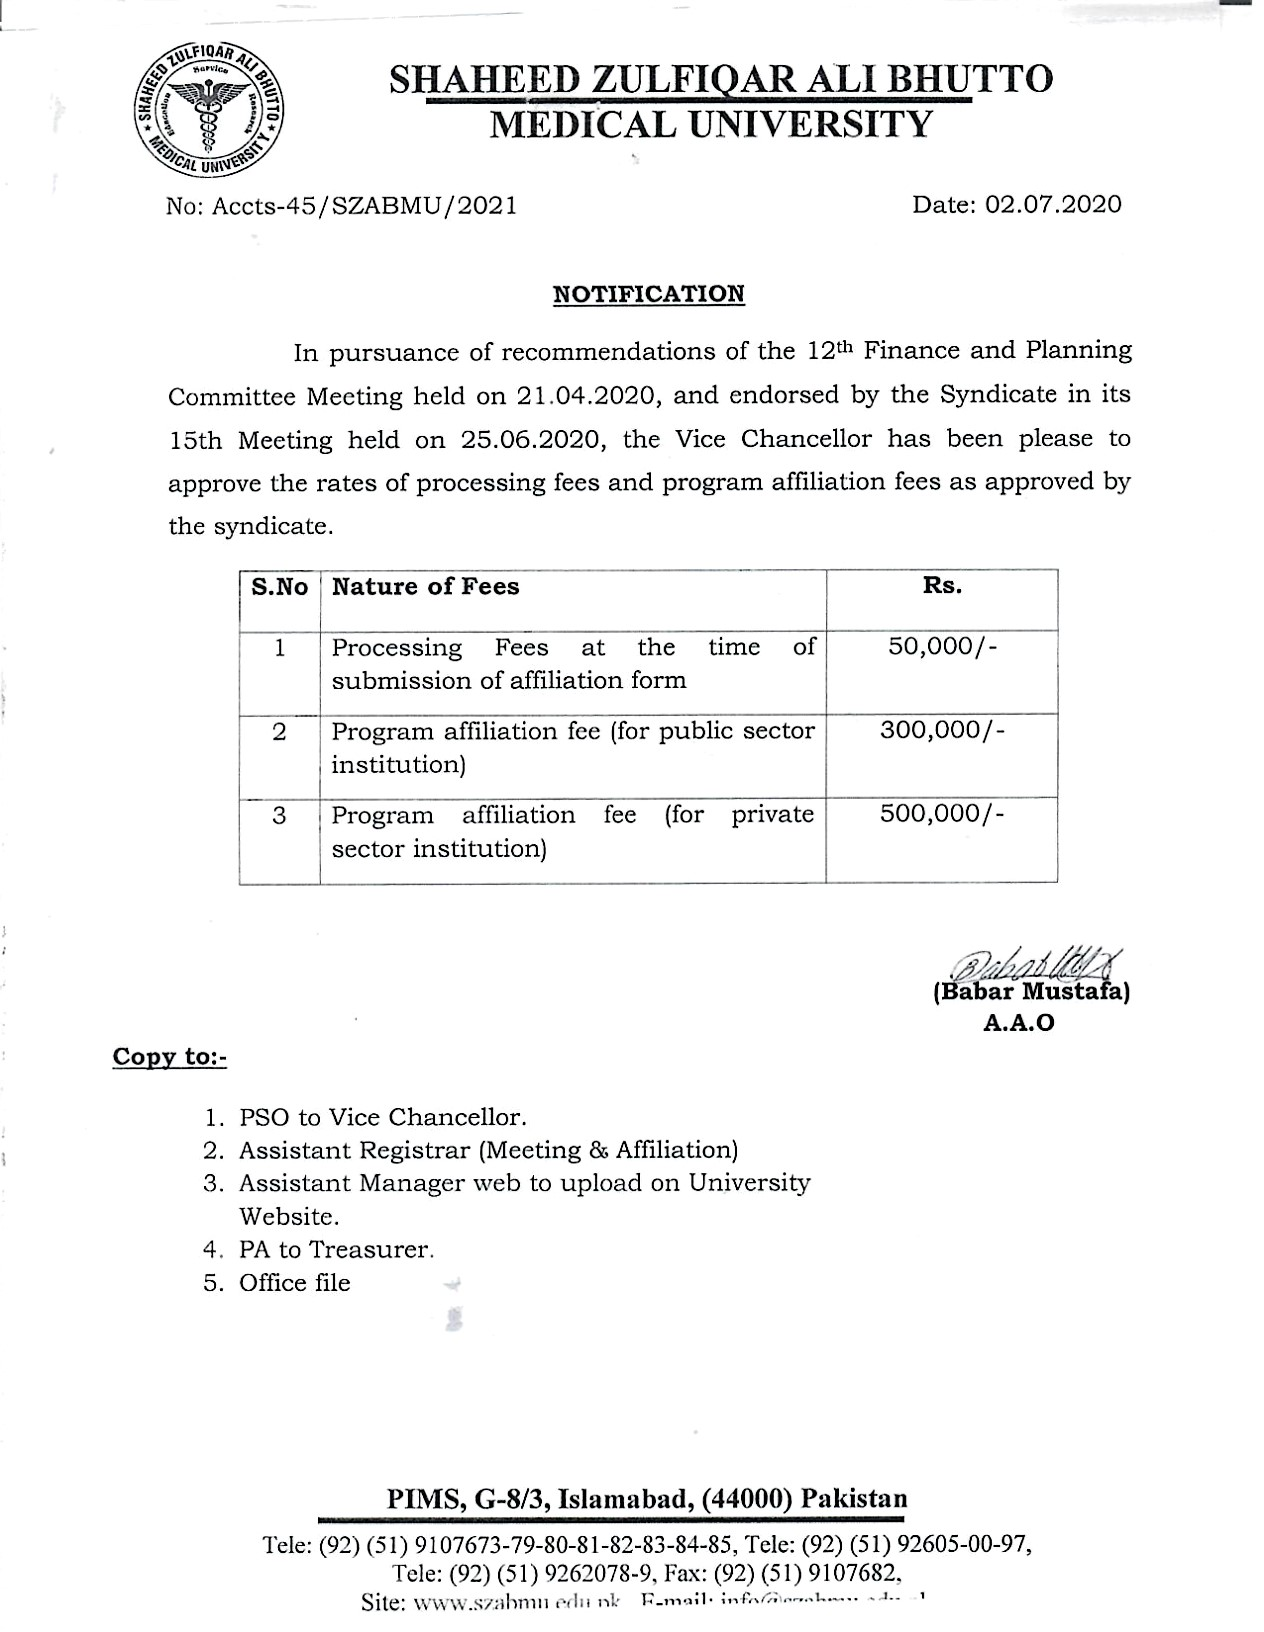 Revised Affiliation Fee